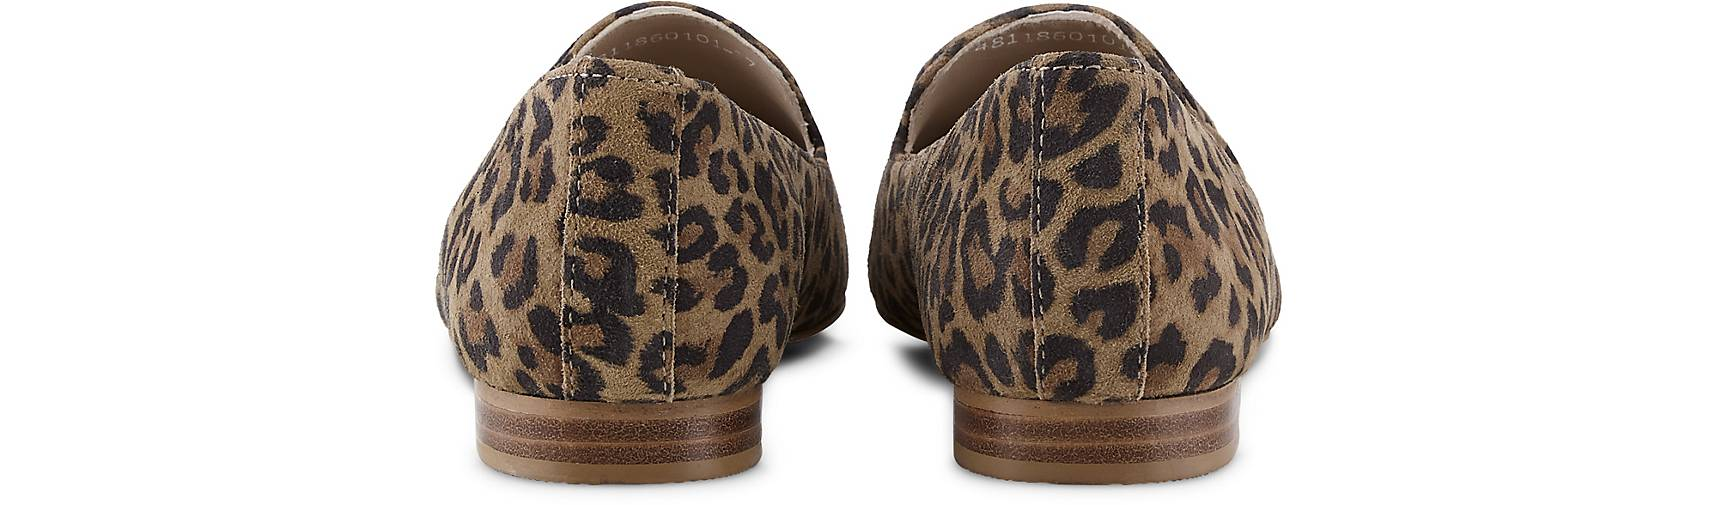 Damen Fashion Damen Leo Fashion slipper 5fzU8wUqx